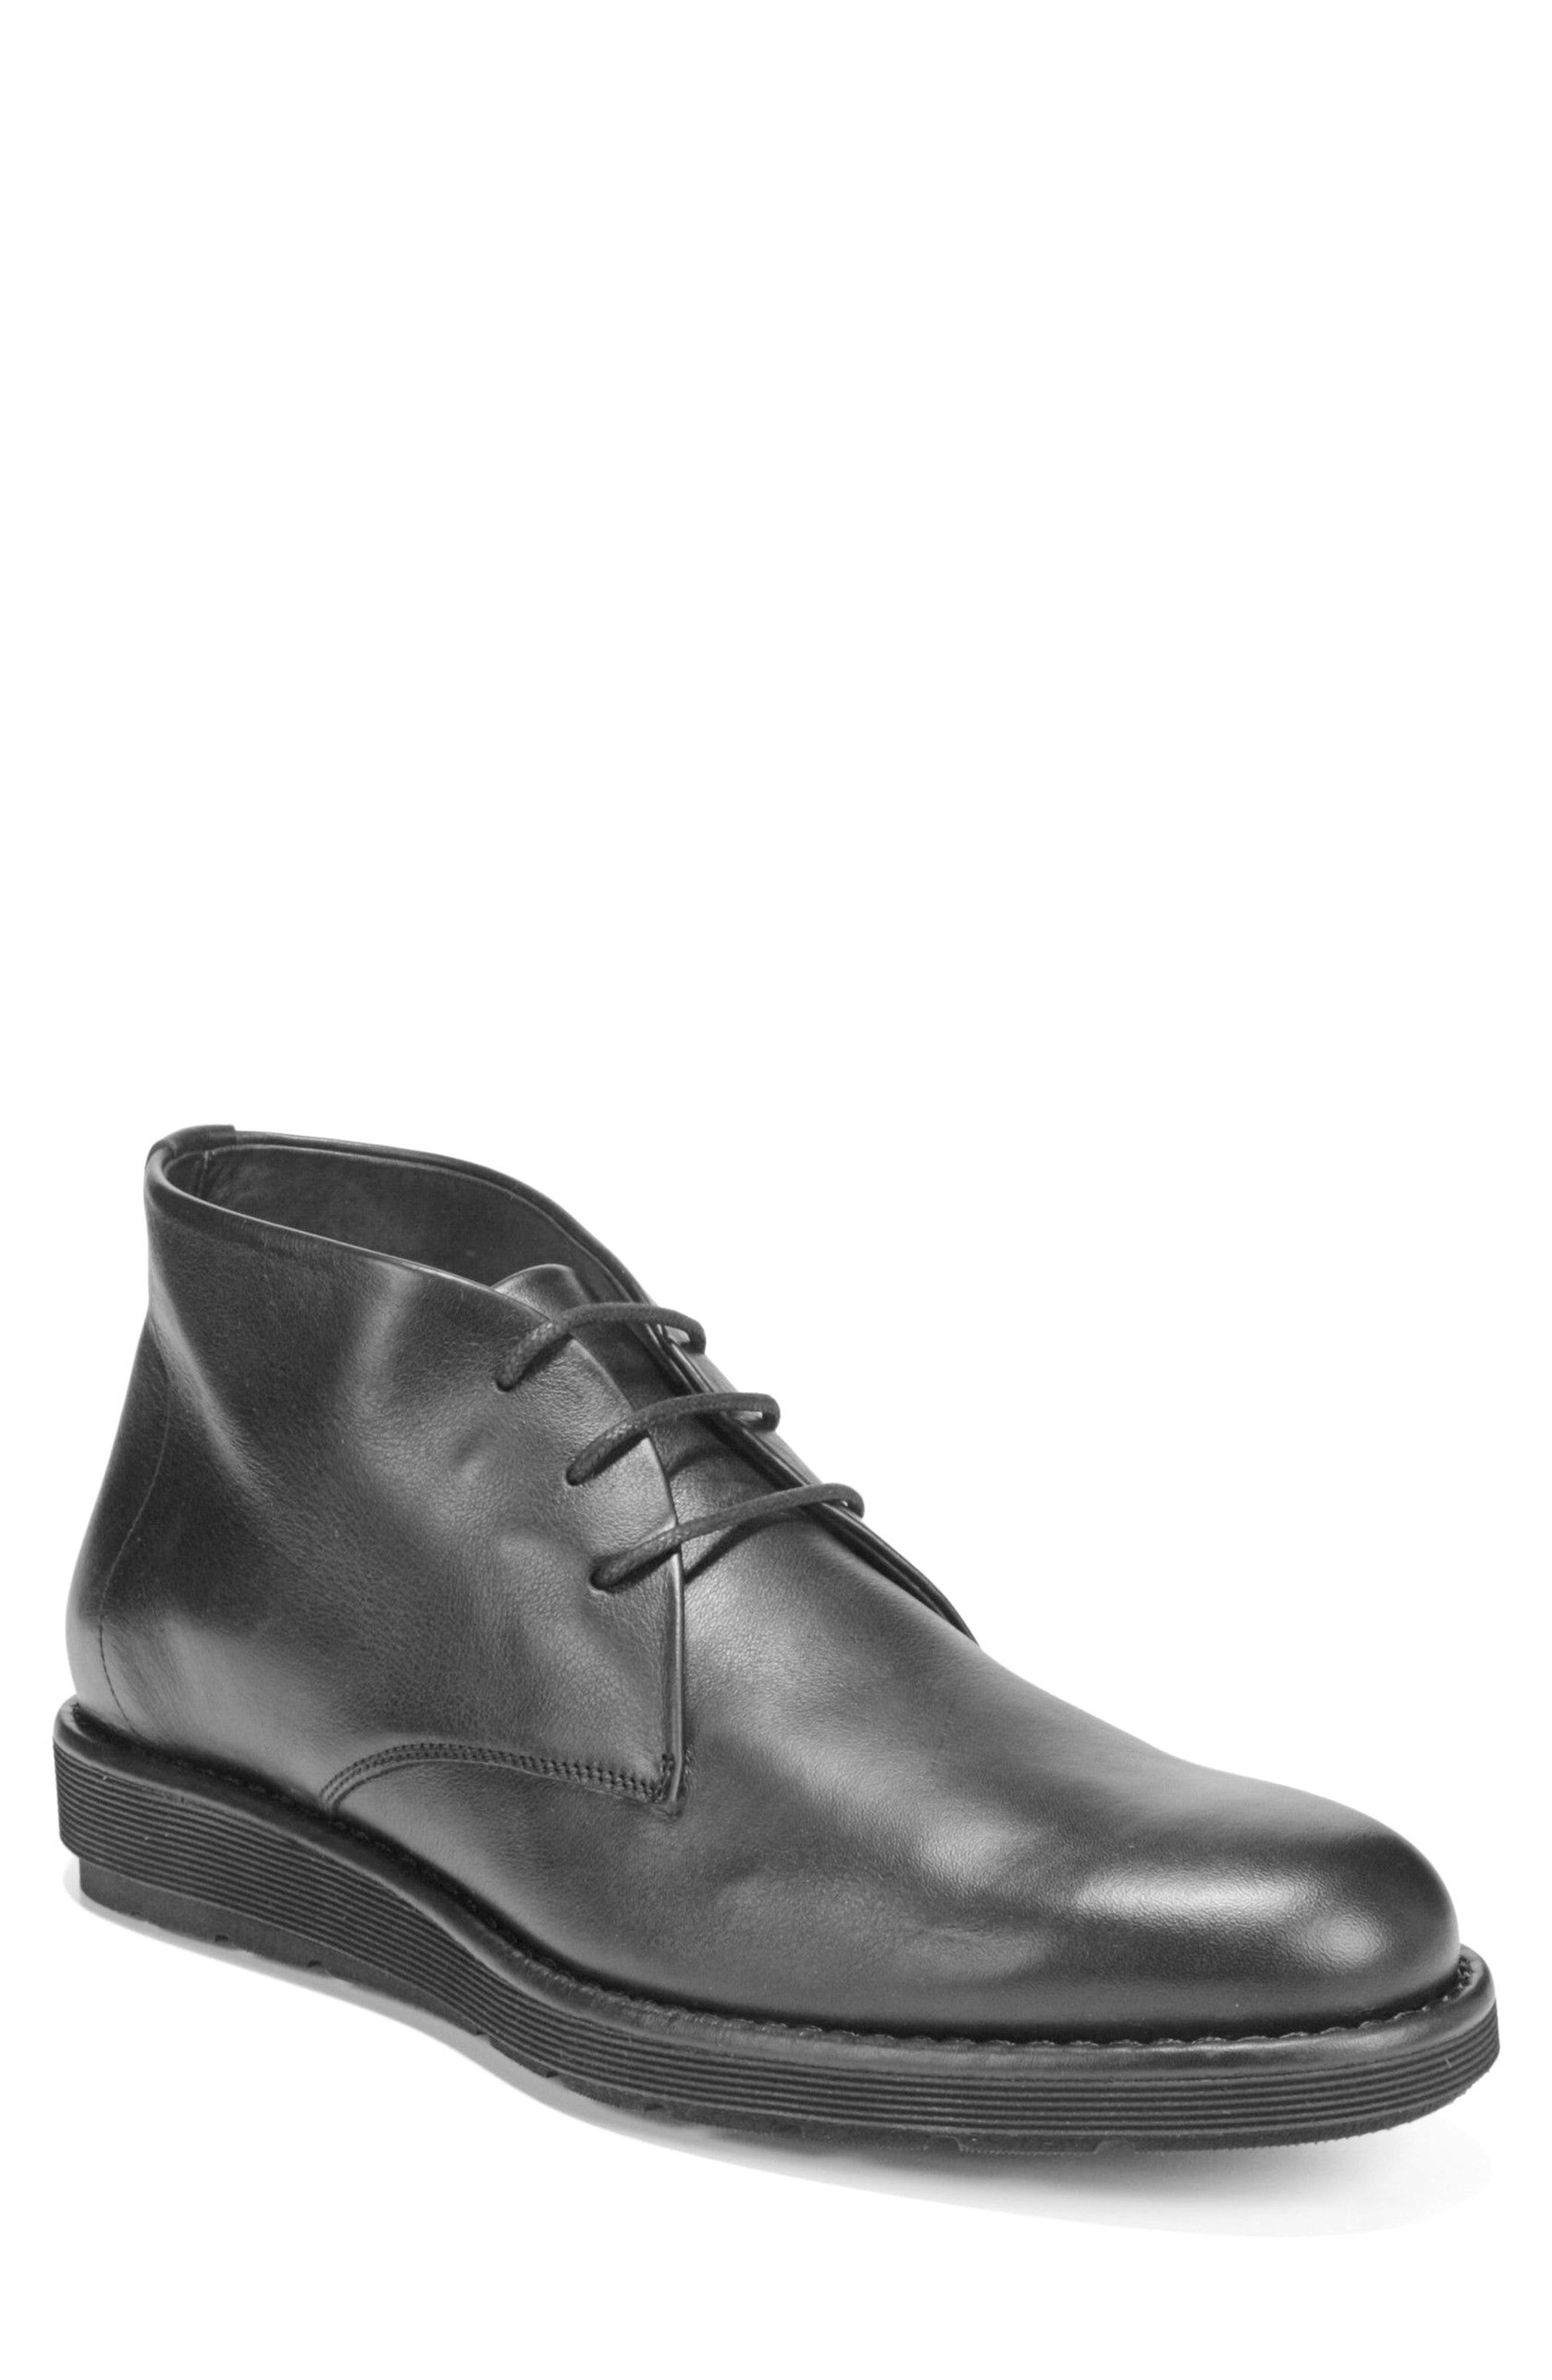 Walden Chukka Boot,                         Main,                         color, BLACK